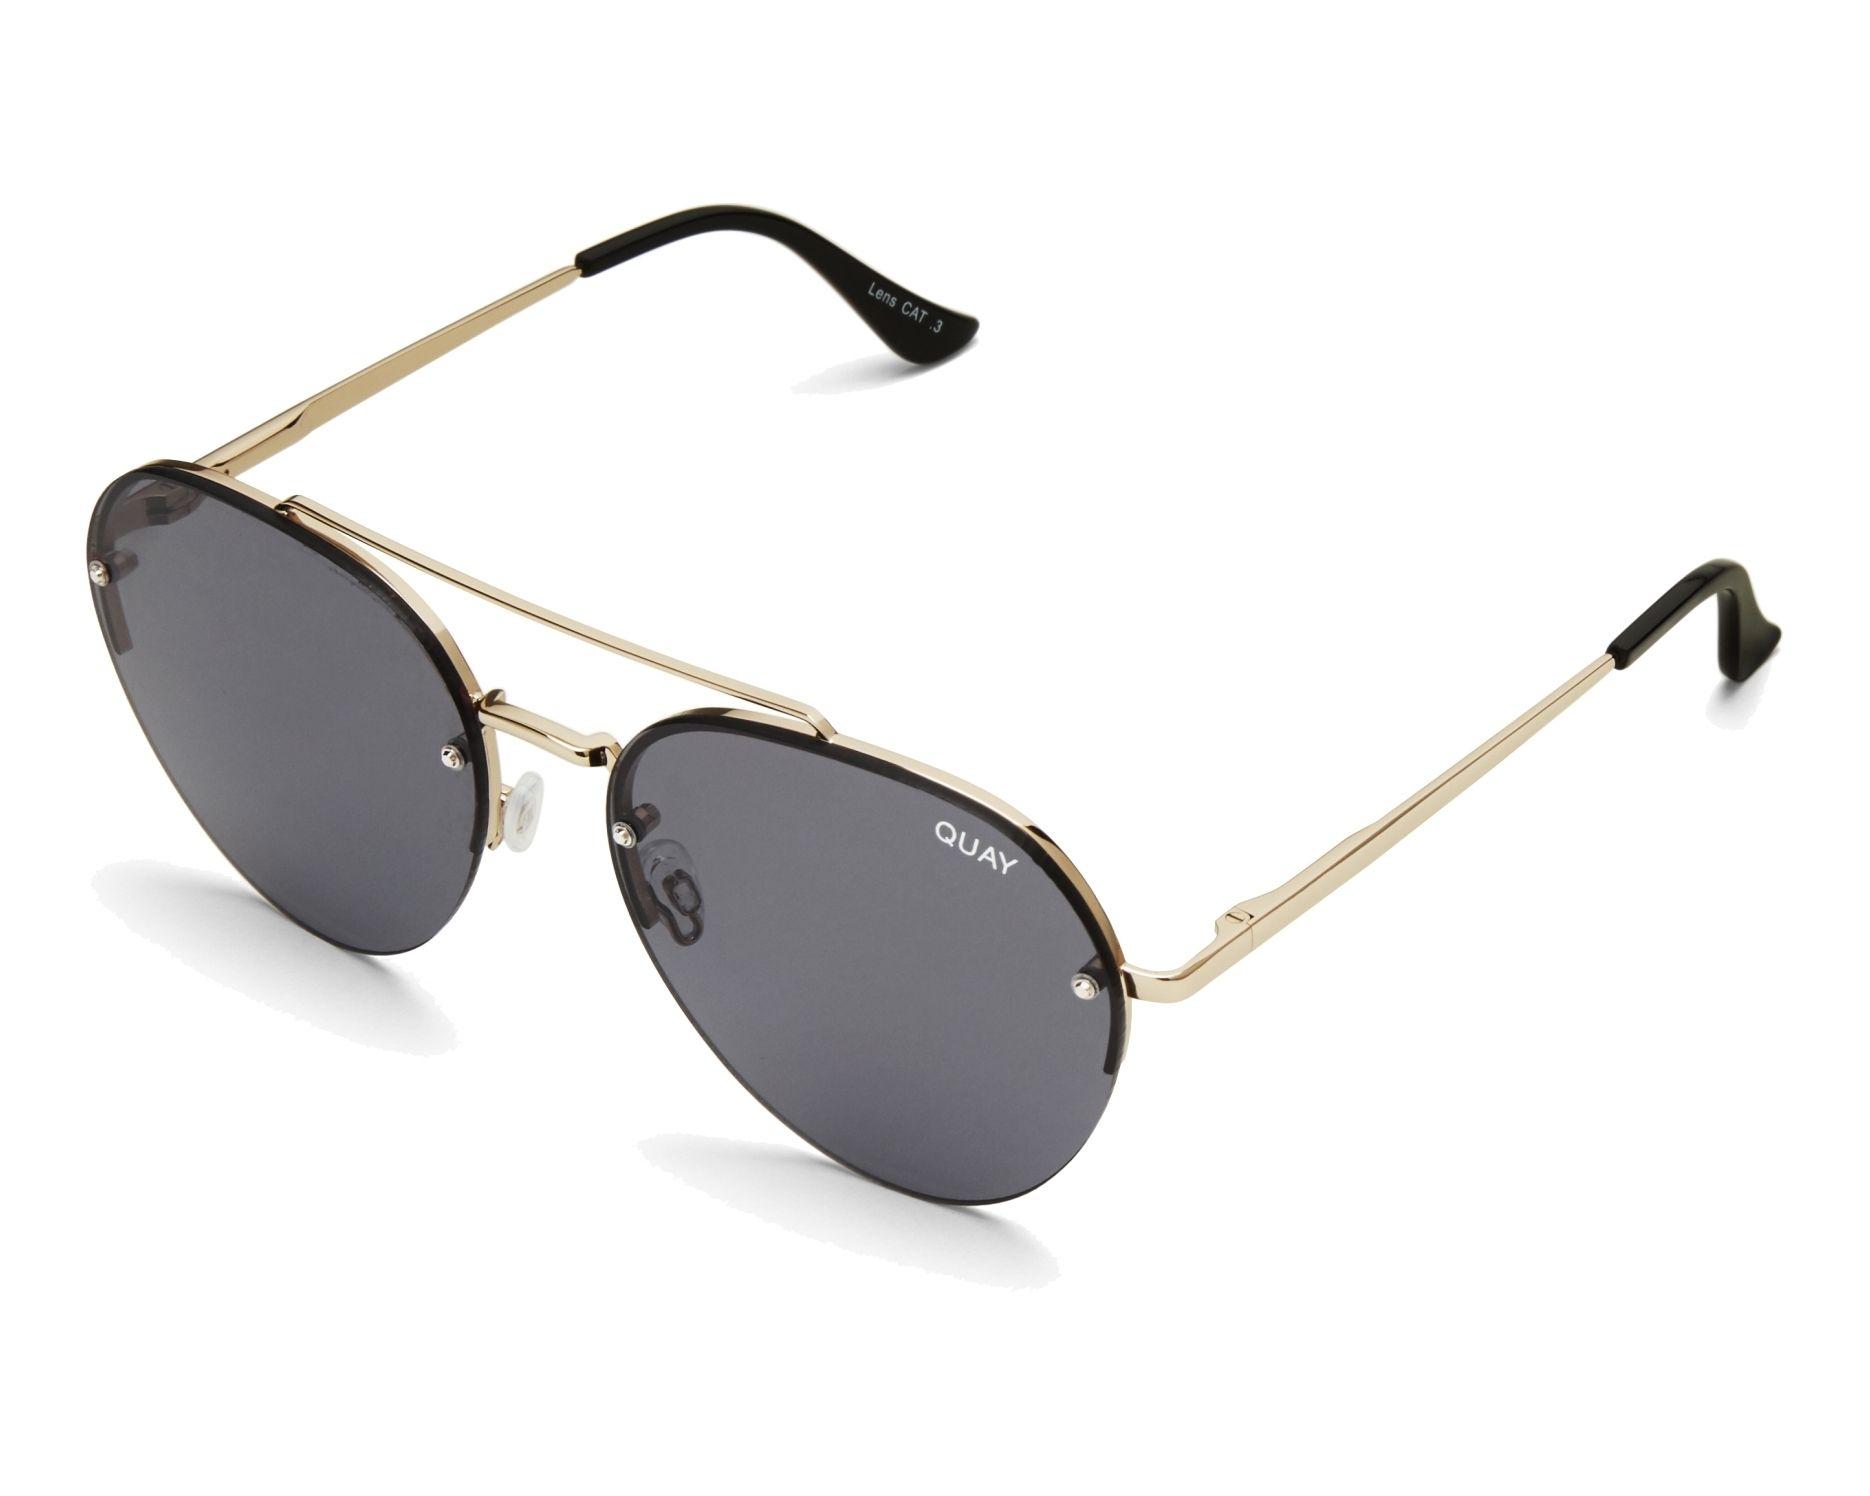 Quay Australia Sunglasses Qw 000205 Gld Smk Gold Visionet